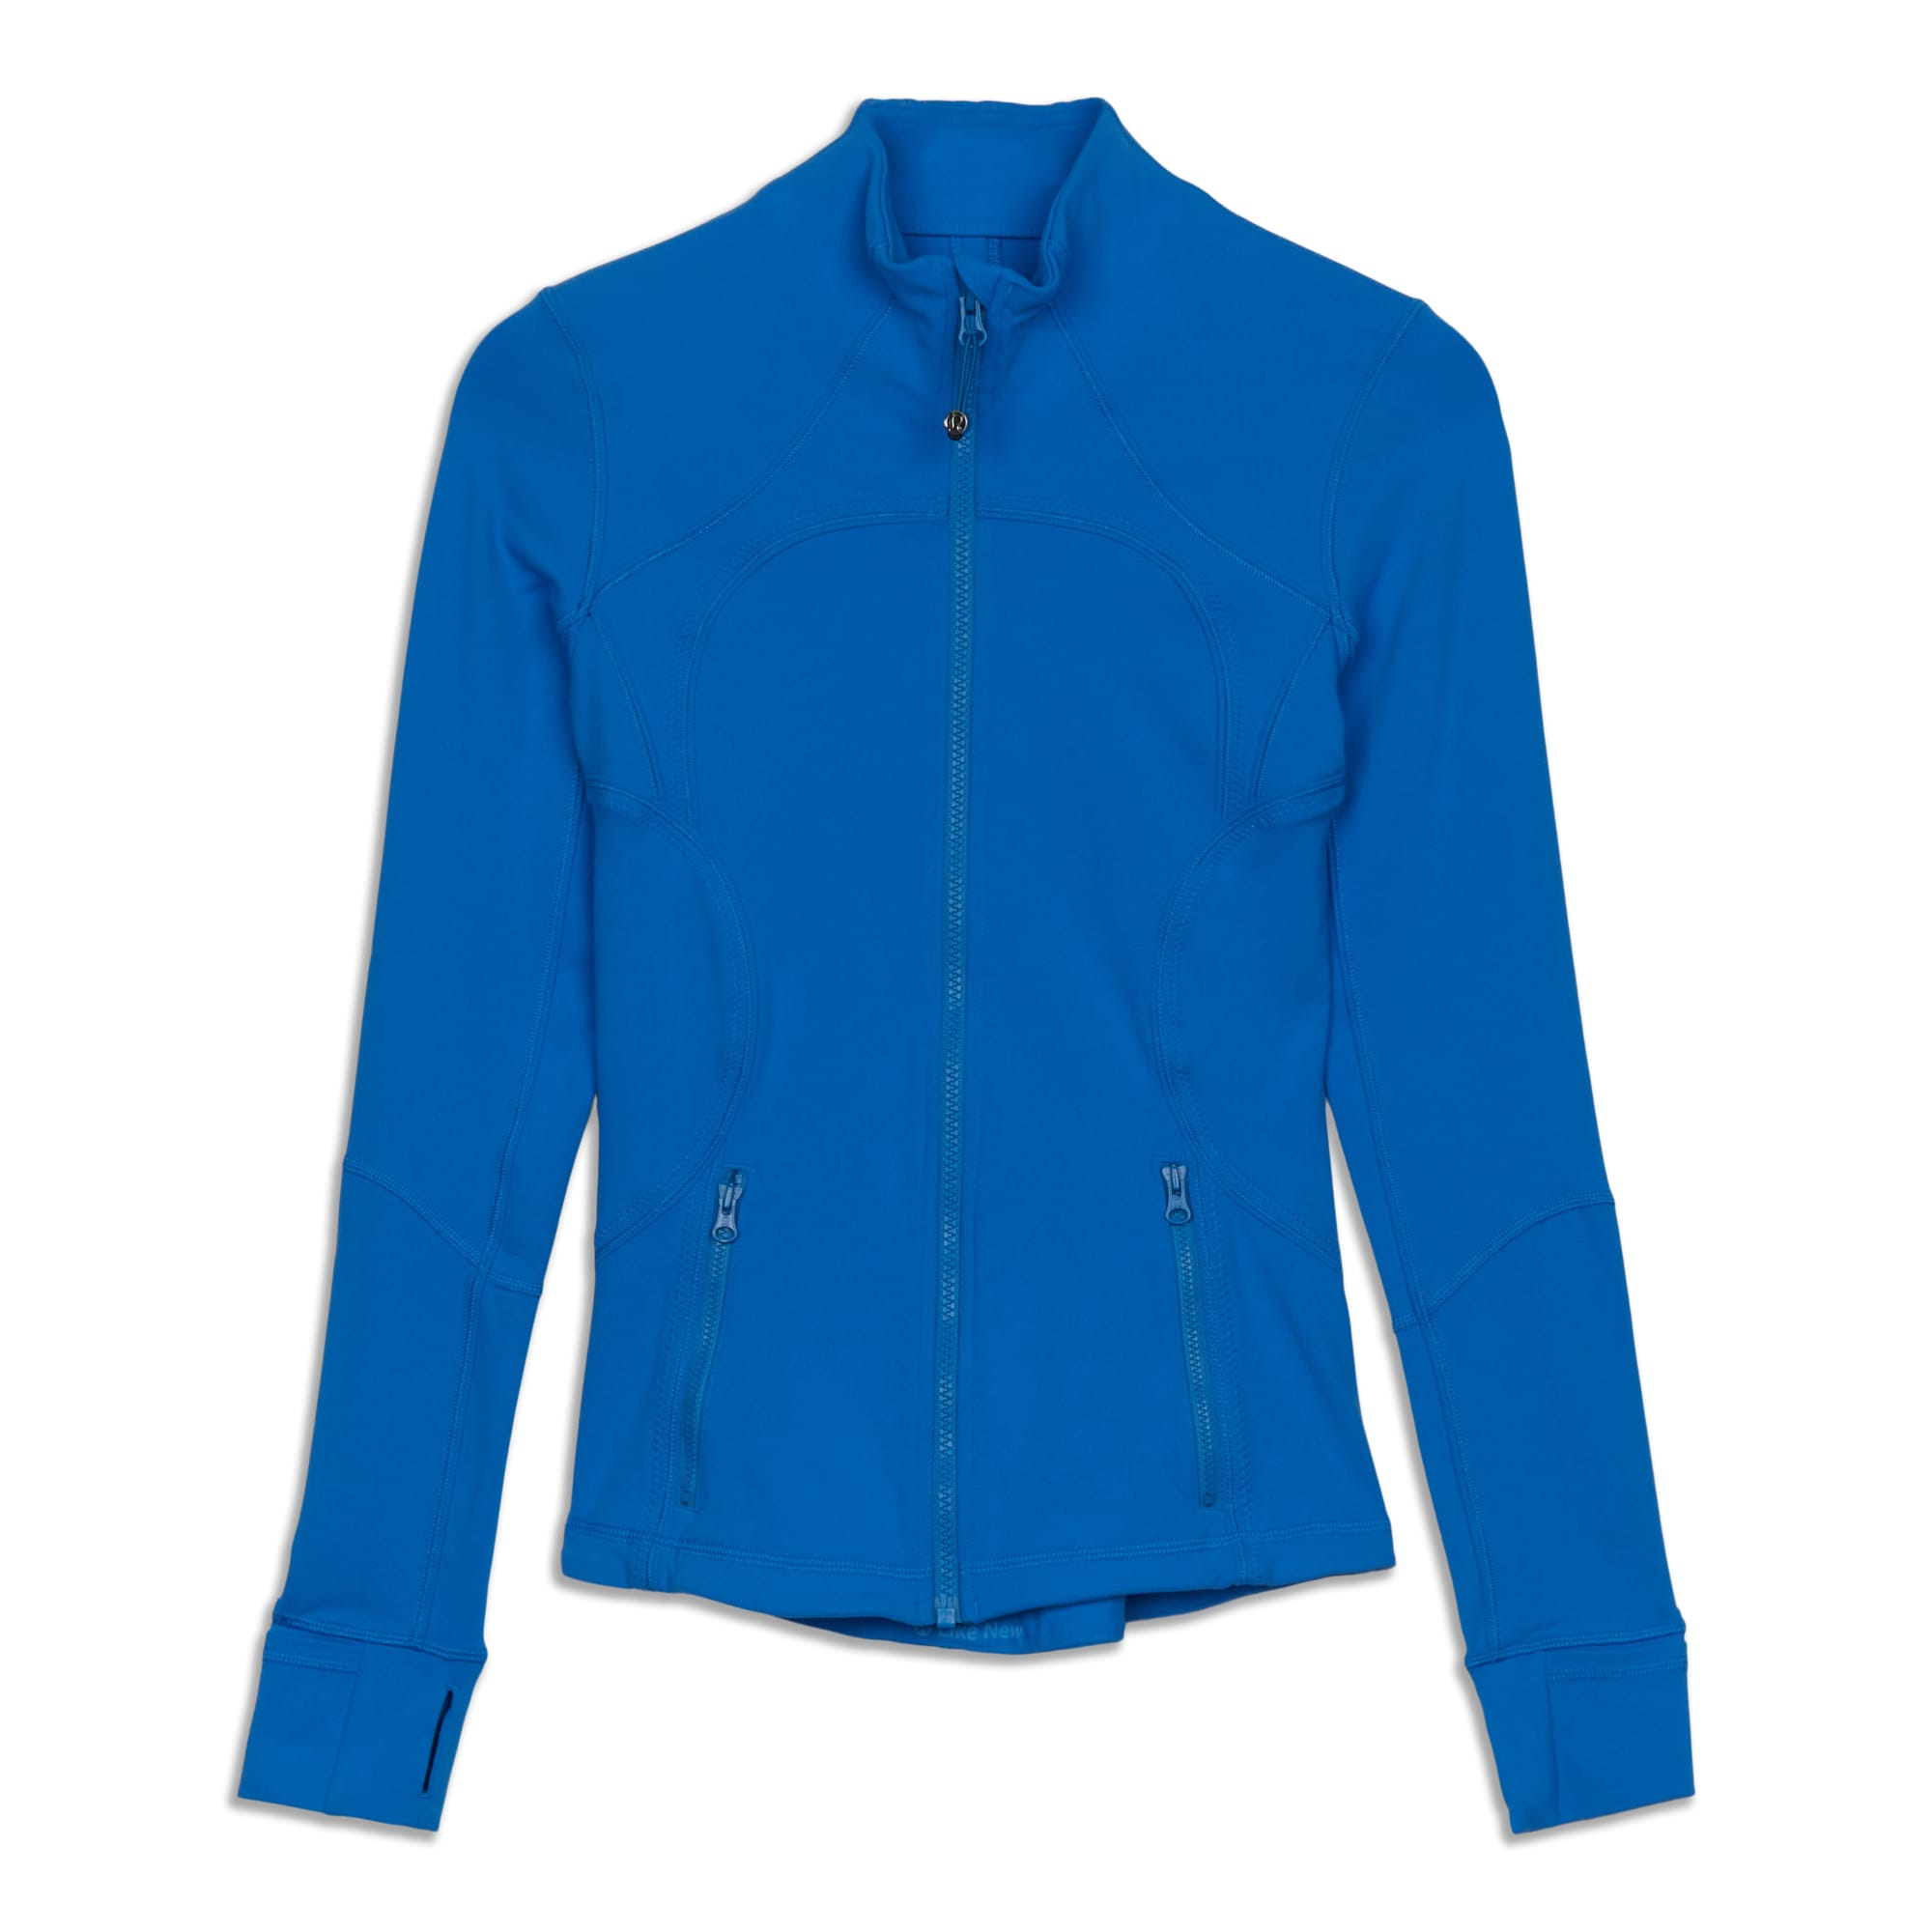 Main product image: Women's Zip Up Jacket - Resale